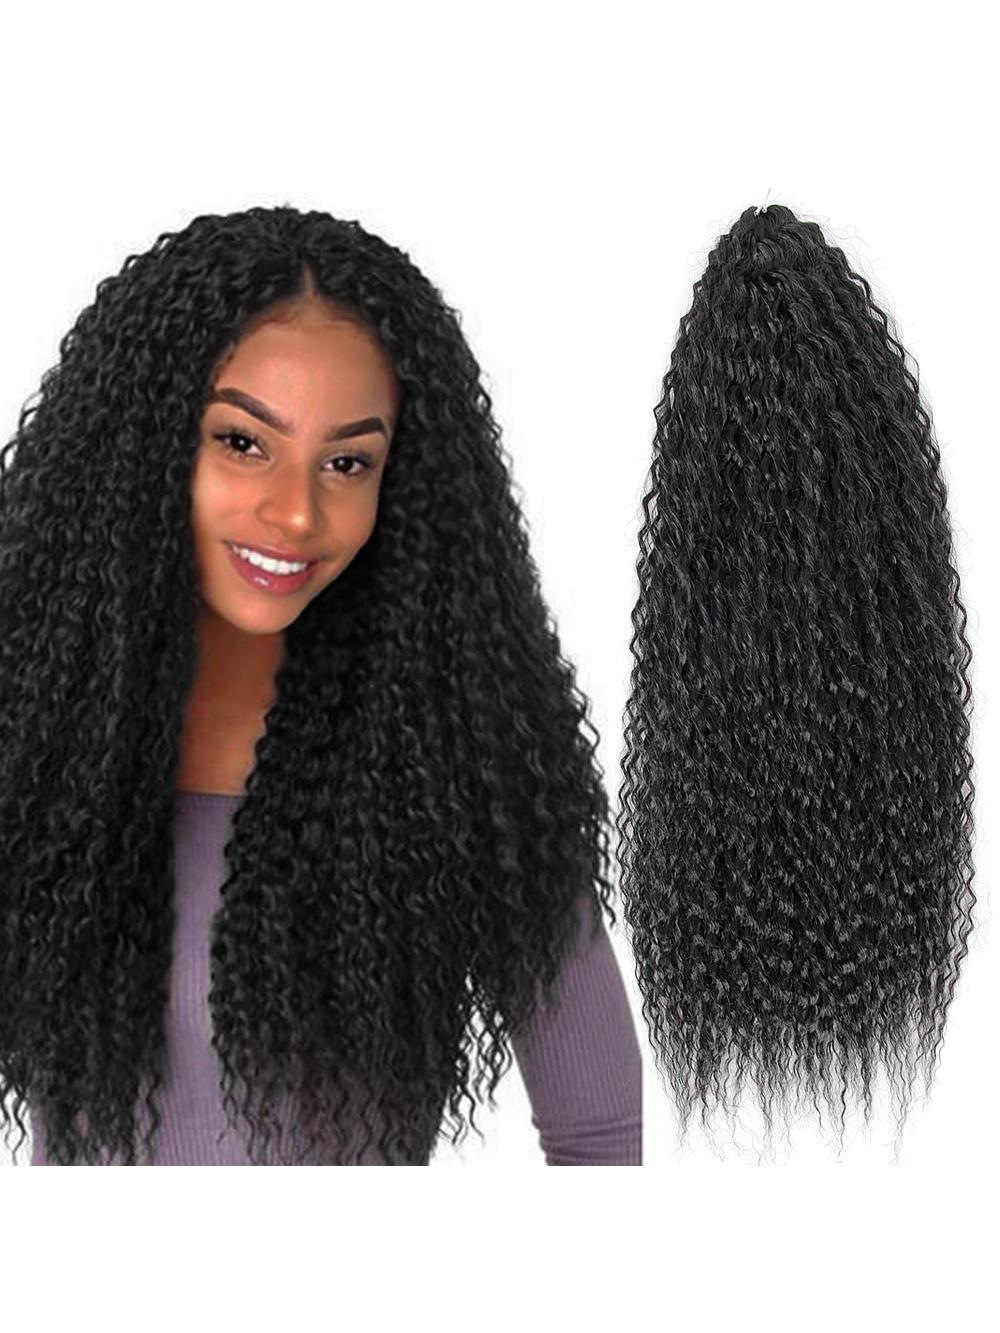 Hair-Extensions Marly-Hair Braiding Yaki Crochet Afro Kinky Curly Soft Yxcheris Synthetic